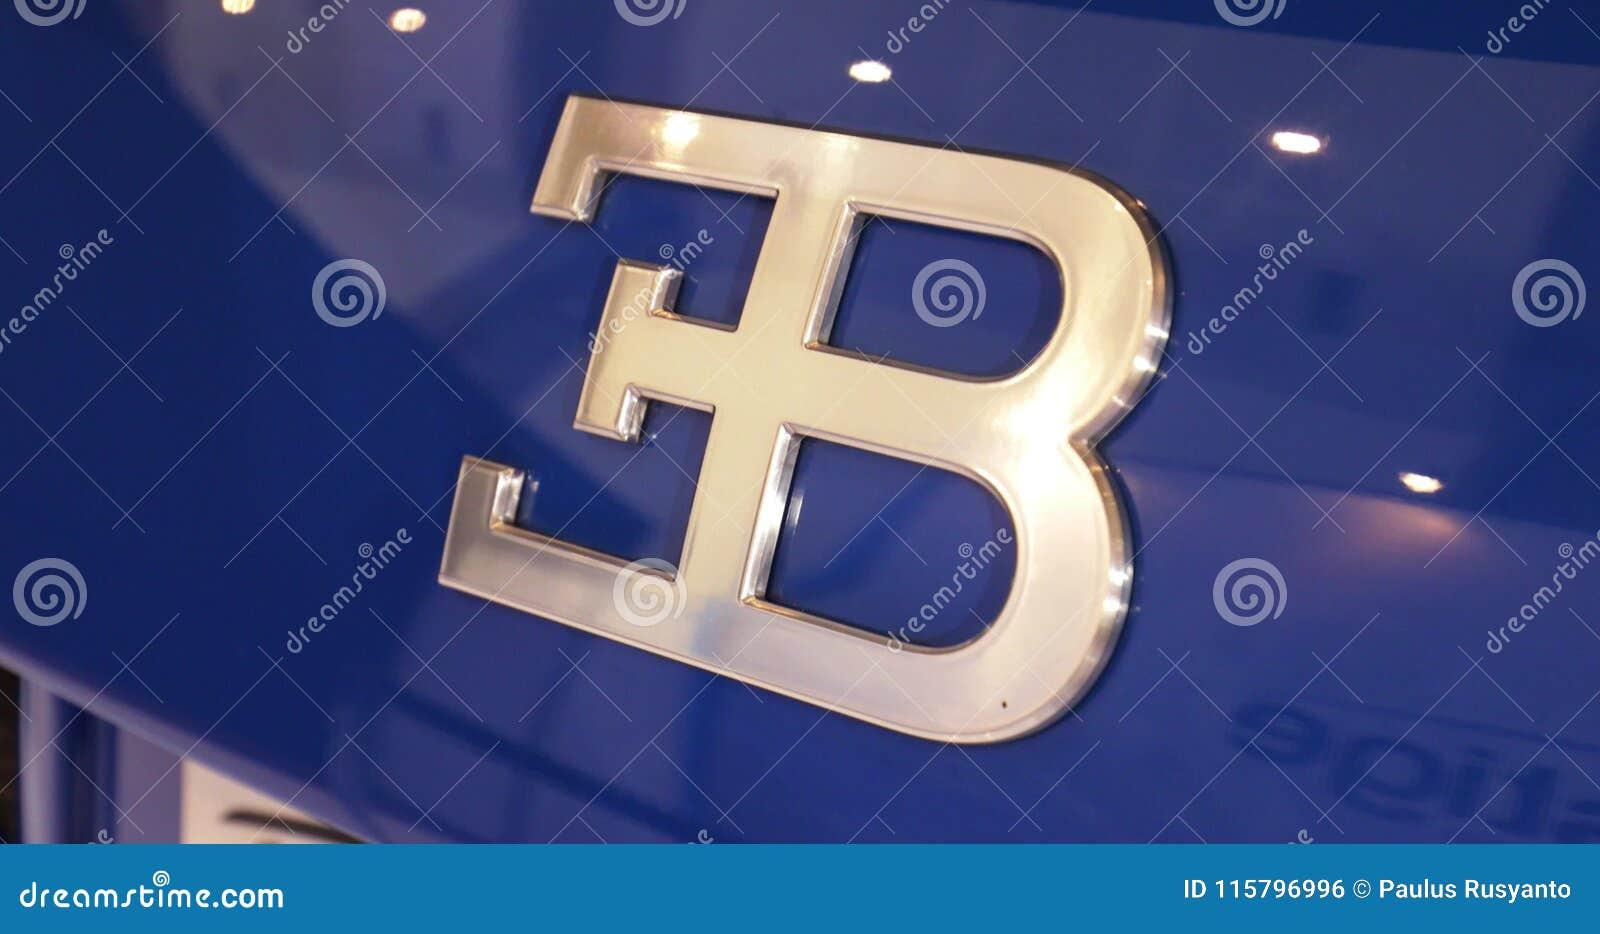 Bugatti Symbol On The Bugatti Veyron Car Stock Footage Video Of